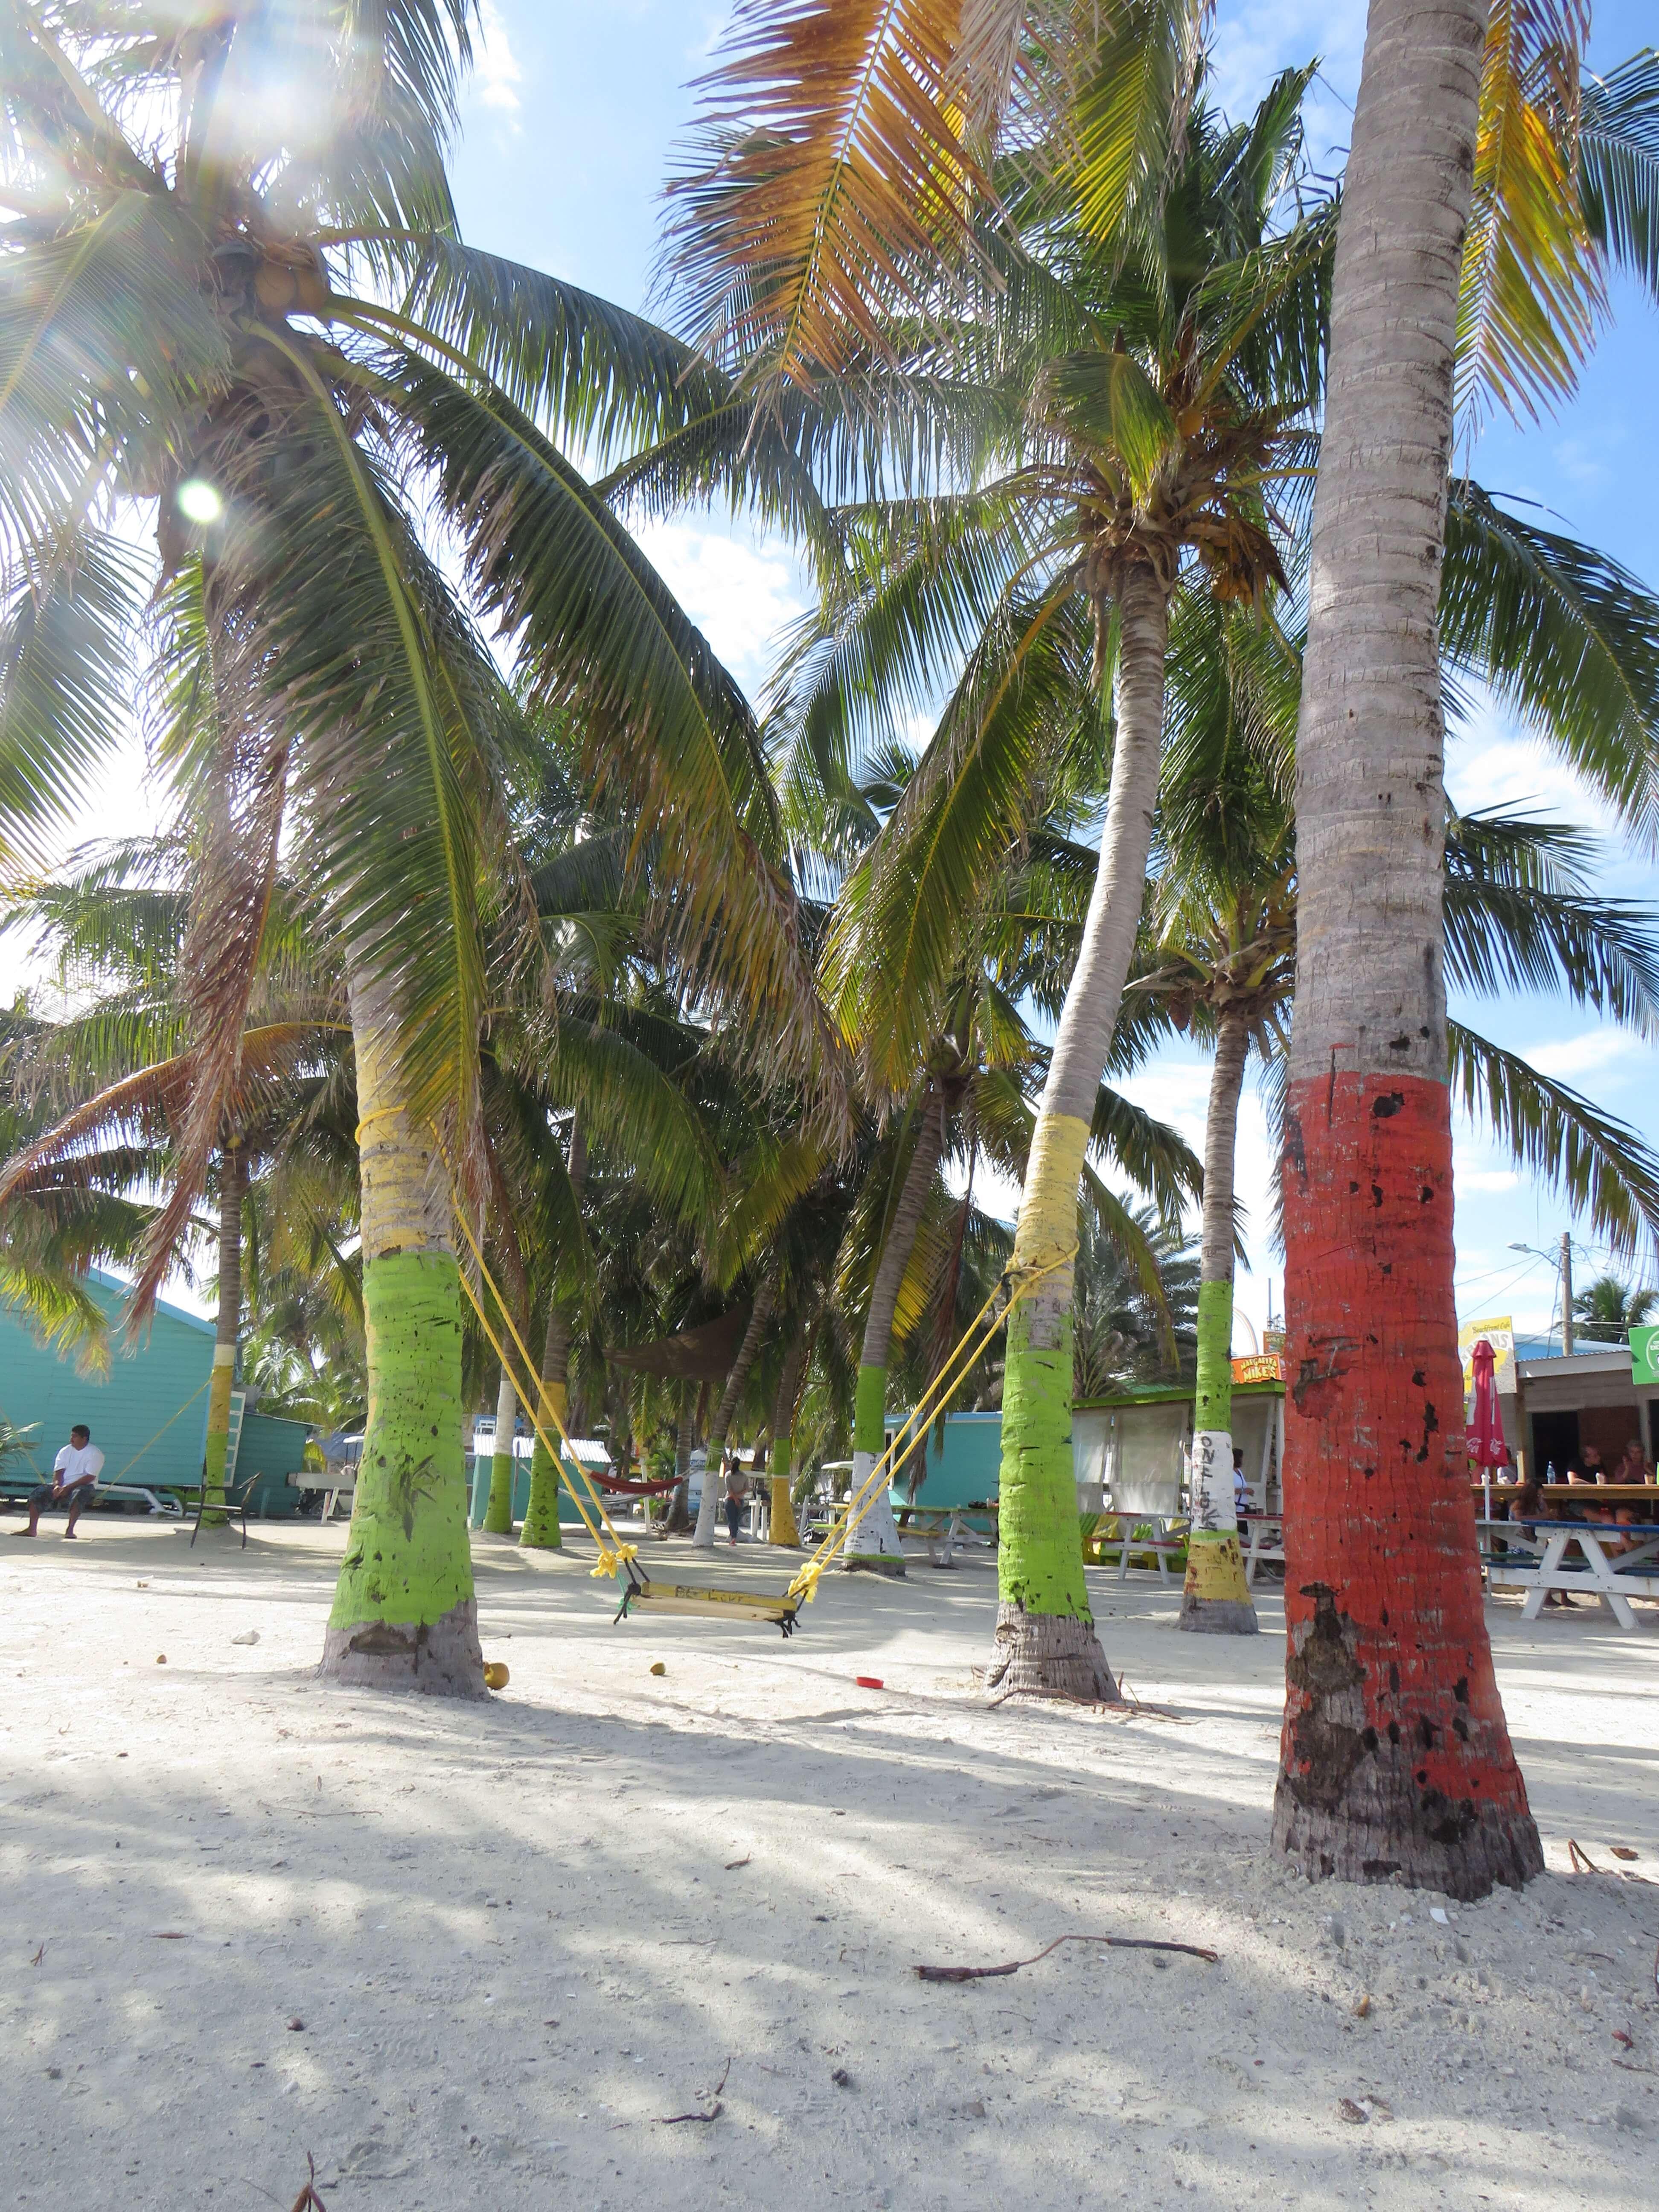 Caye  Caulker in Belize